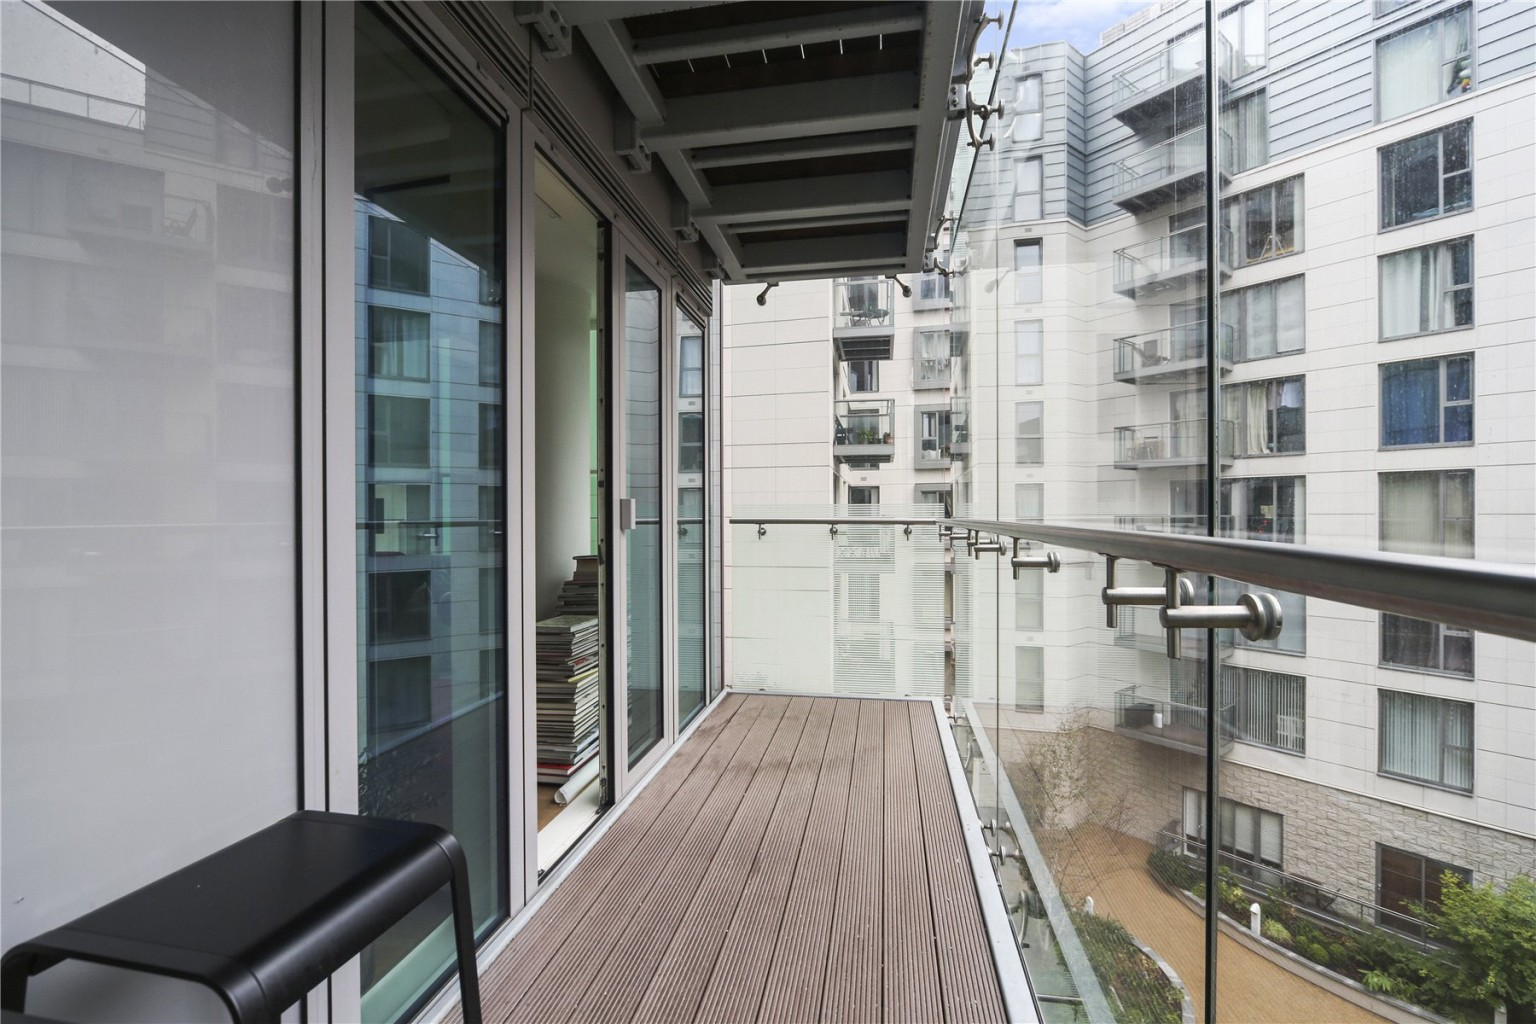 Appartamenti Vendita Londra Brick Lane